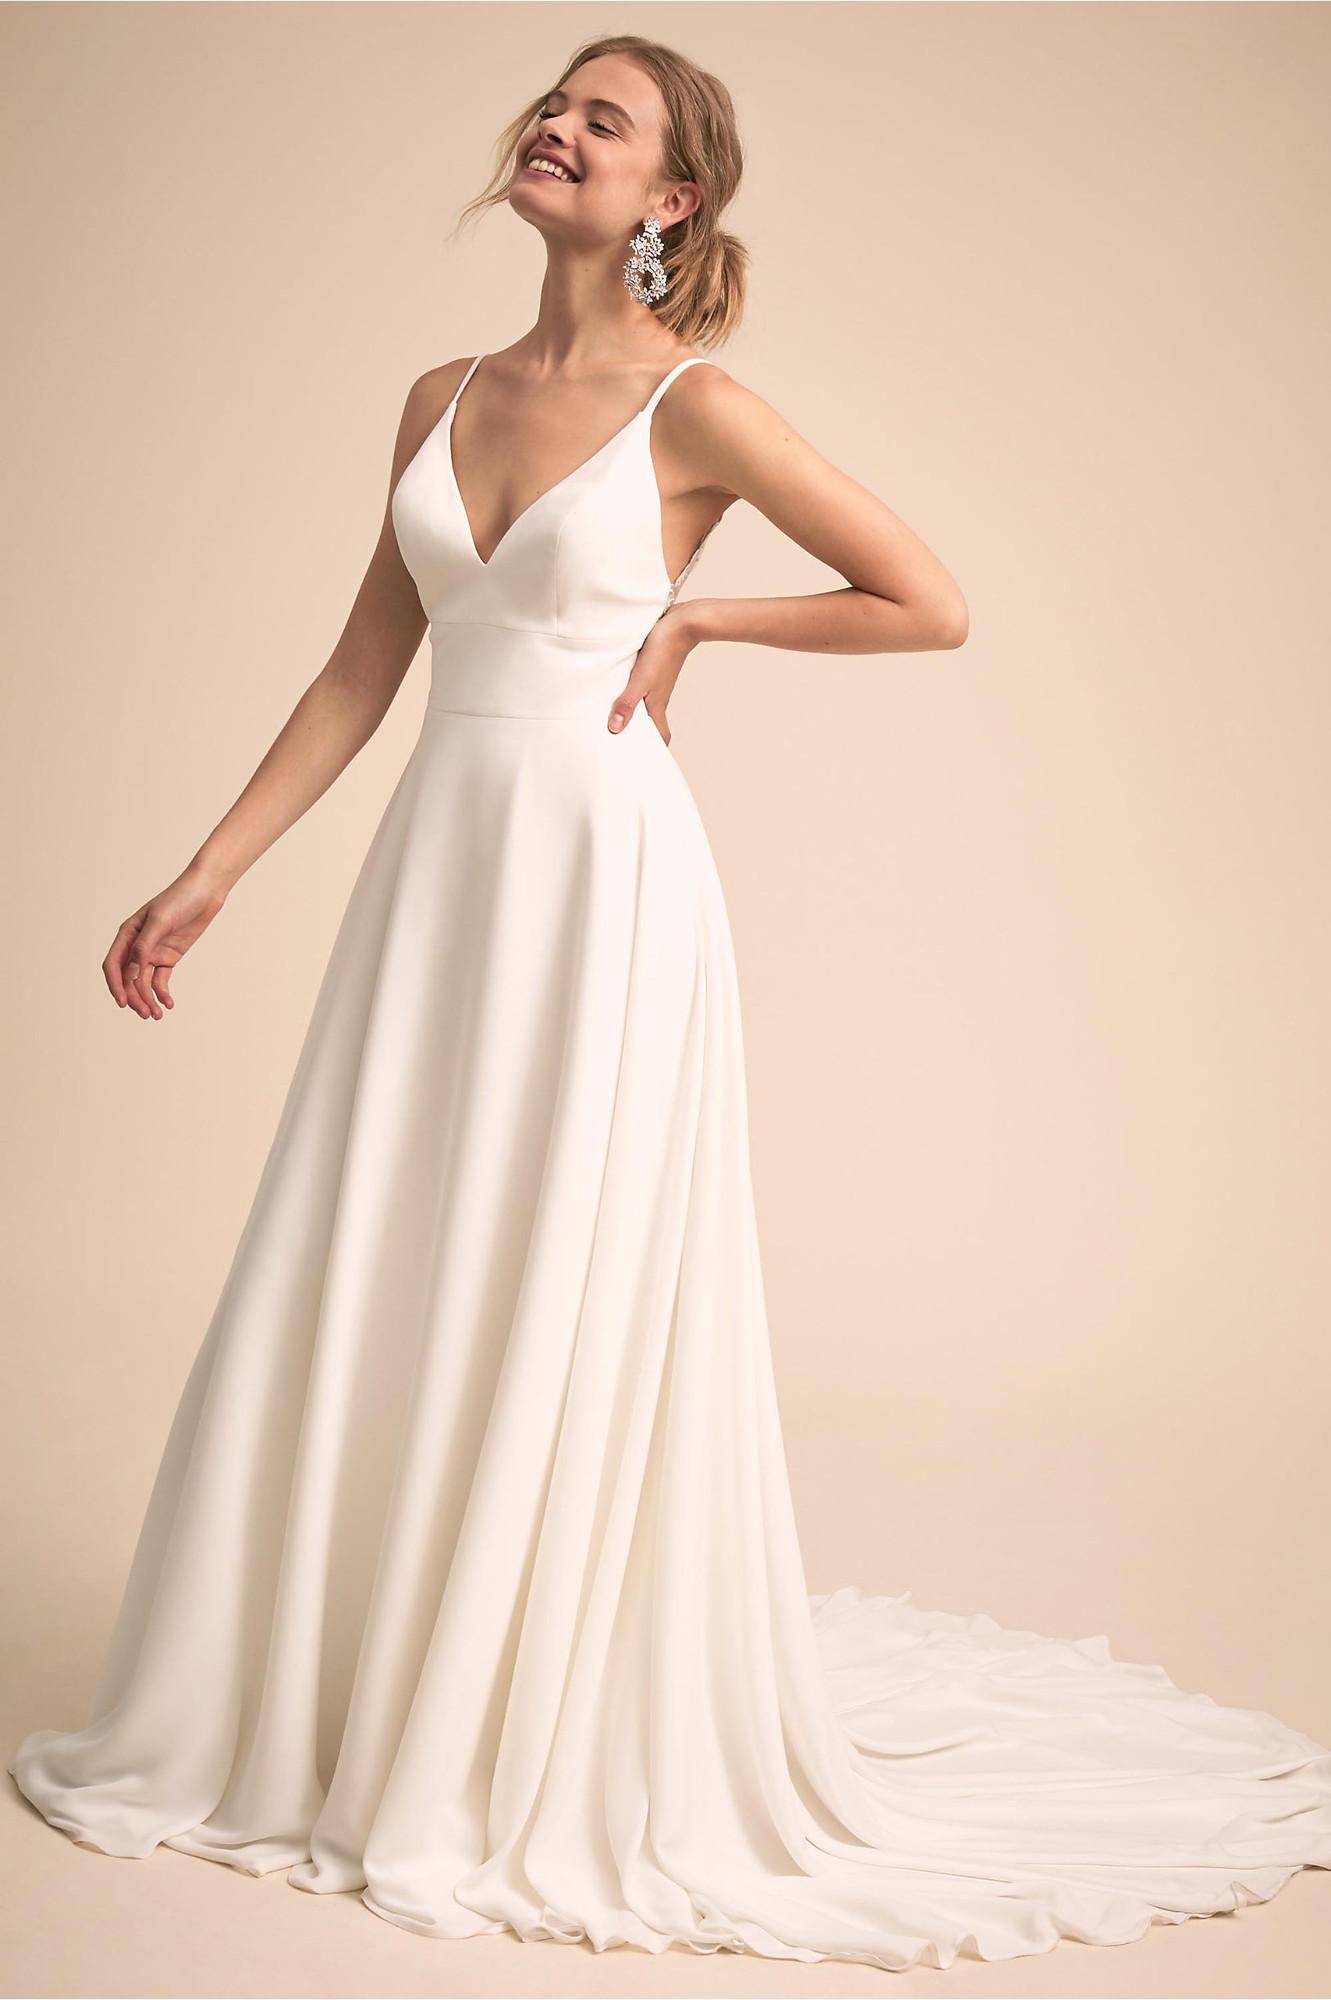 BHLDN Wedding Dresses, BHLDN Photos - WeddingWire.com